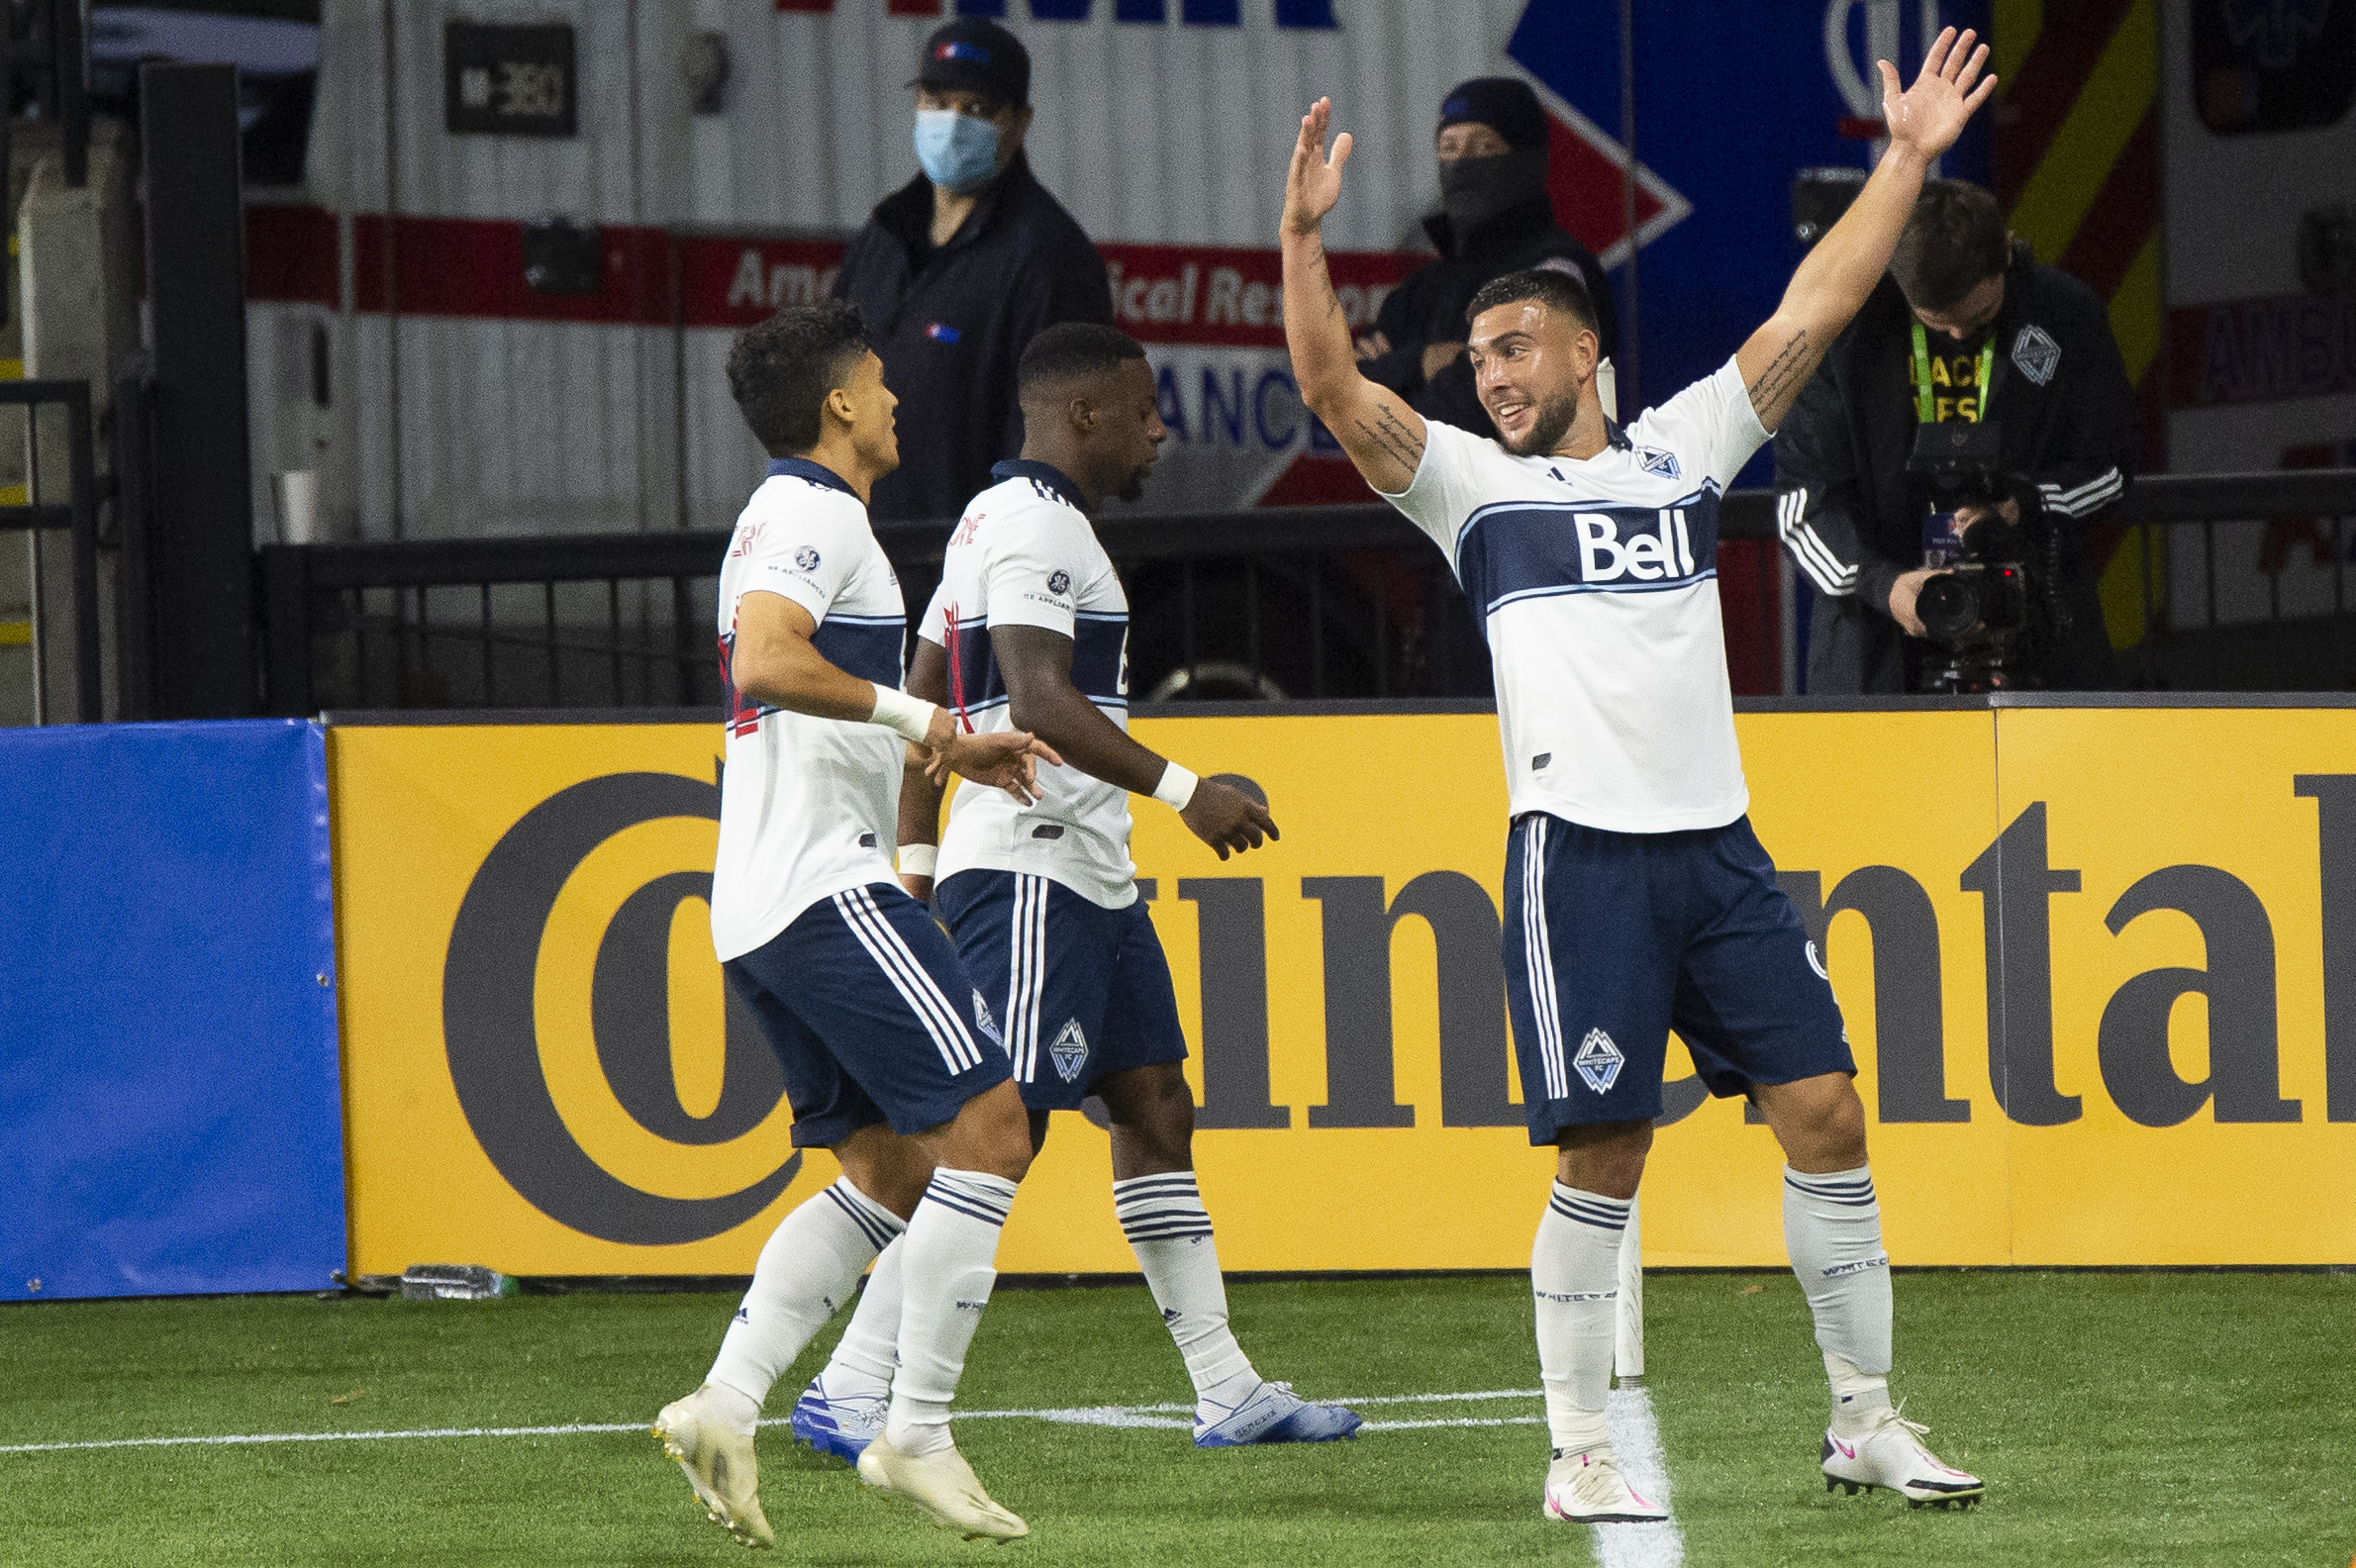 Vancouver Whitecaps 2, Lovek 1 | The MLS 2020 Match Summary